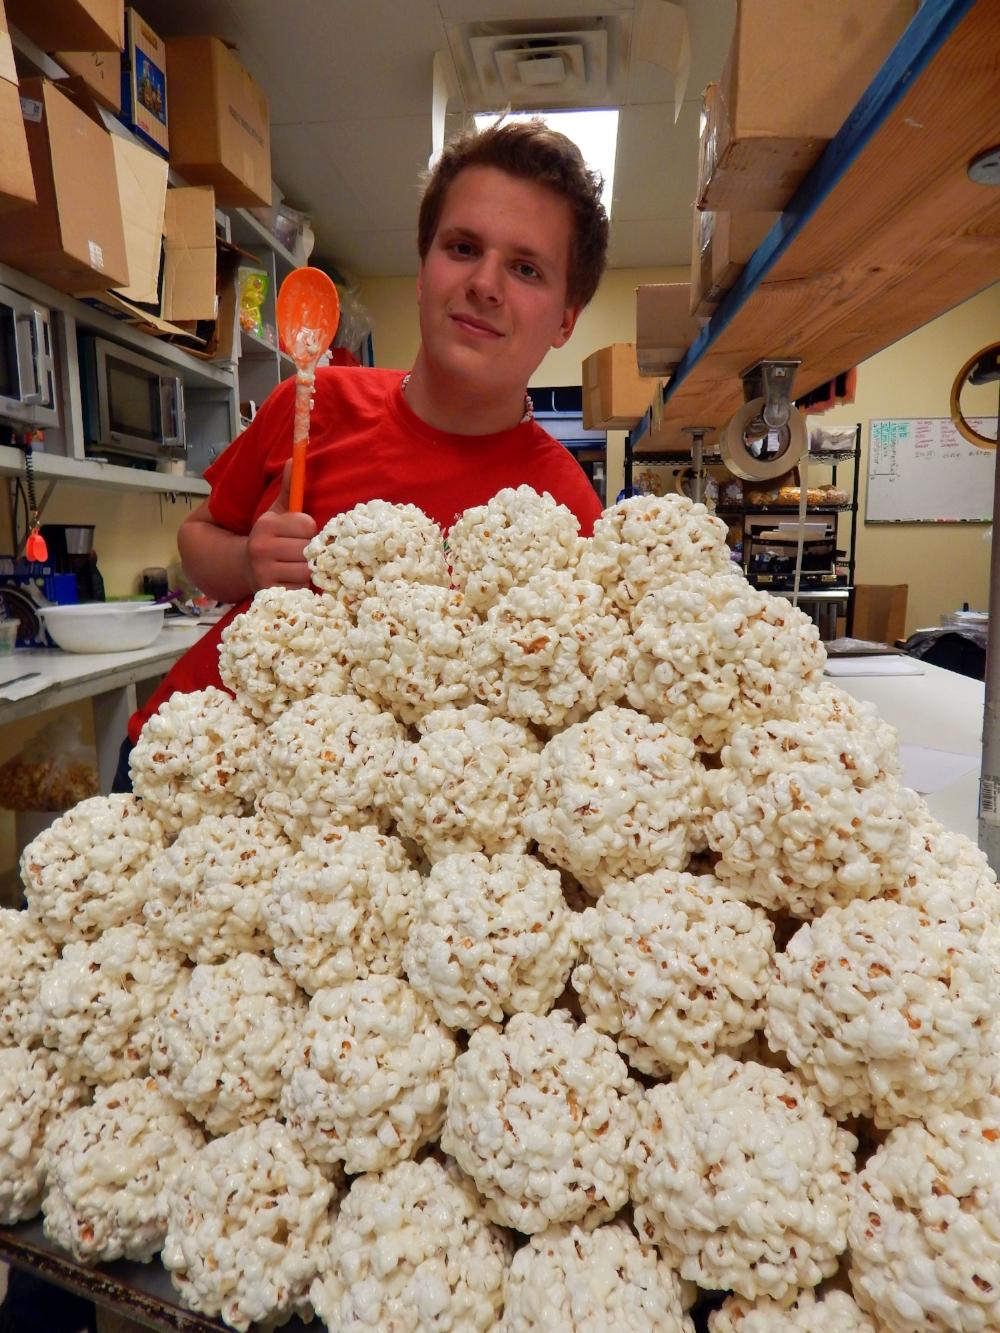 Popcorn Ball Boy - Gideon